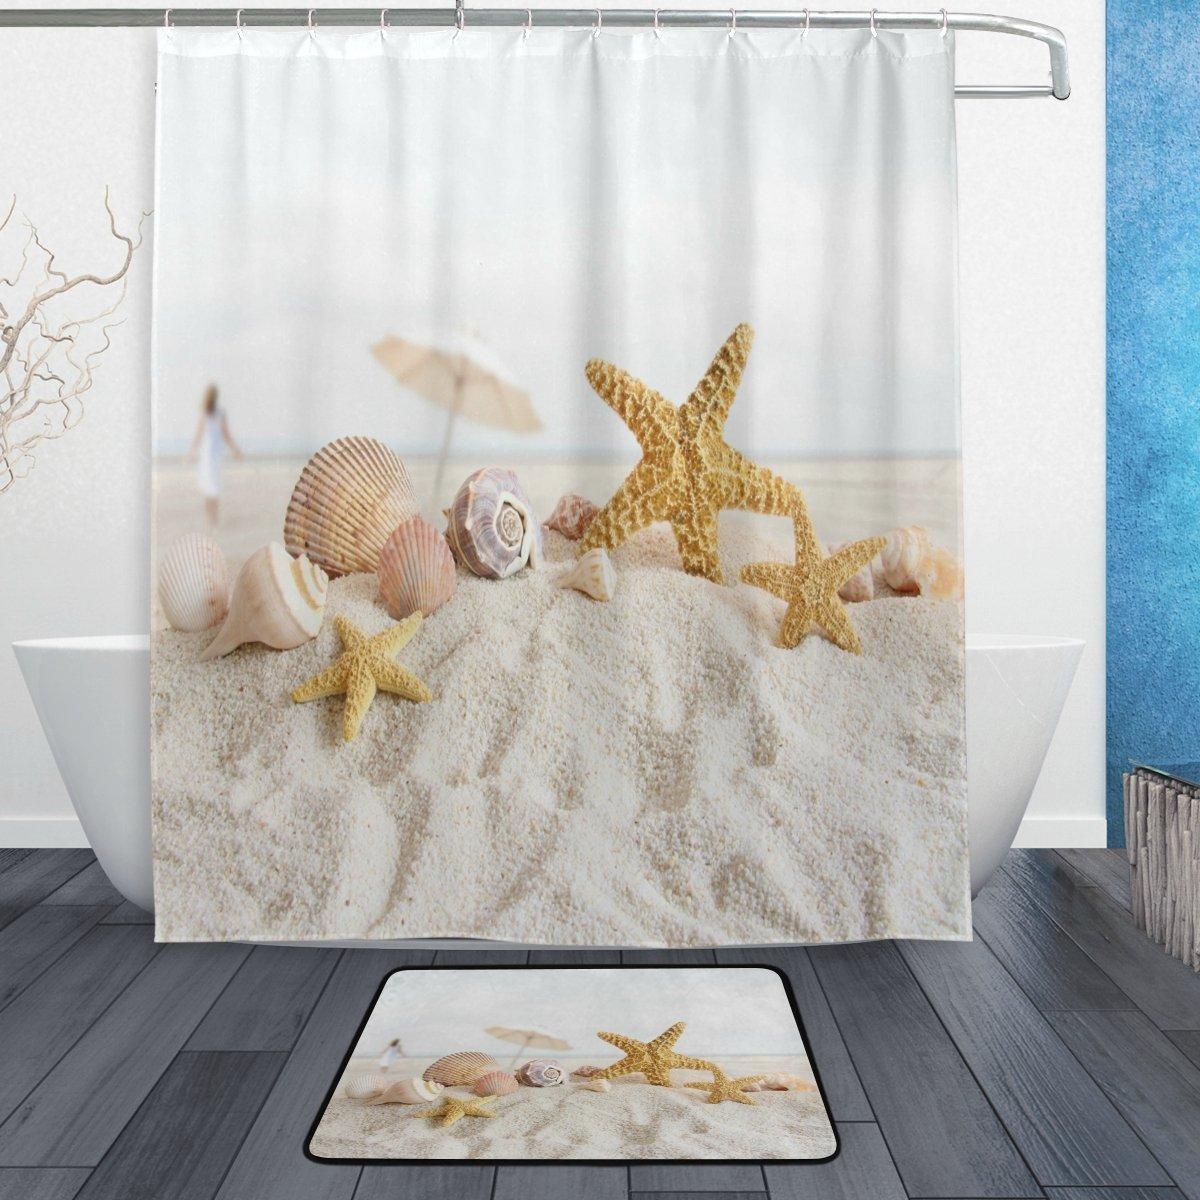 Beach Shower Curtains Bathroom Curtain Waterproof ...